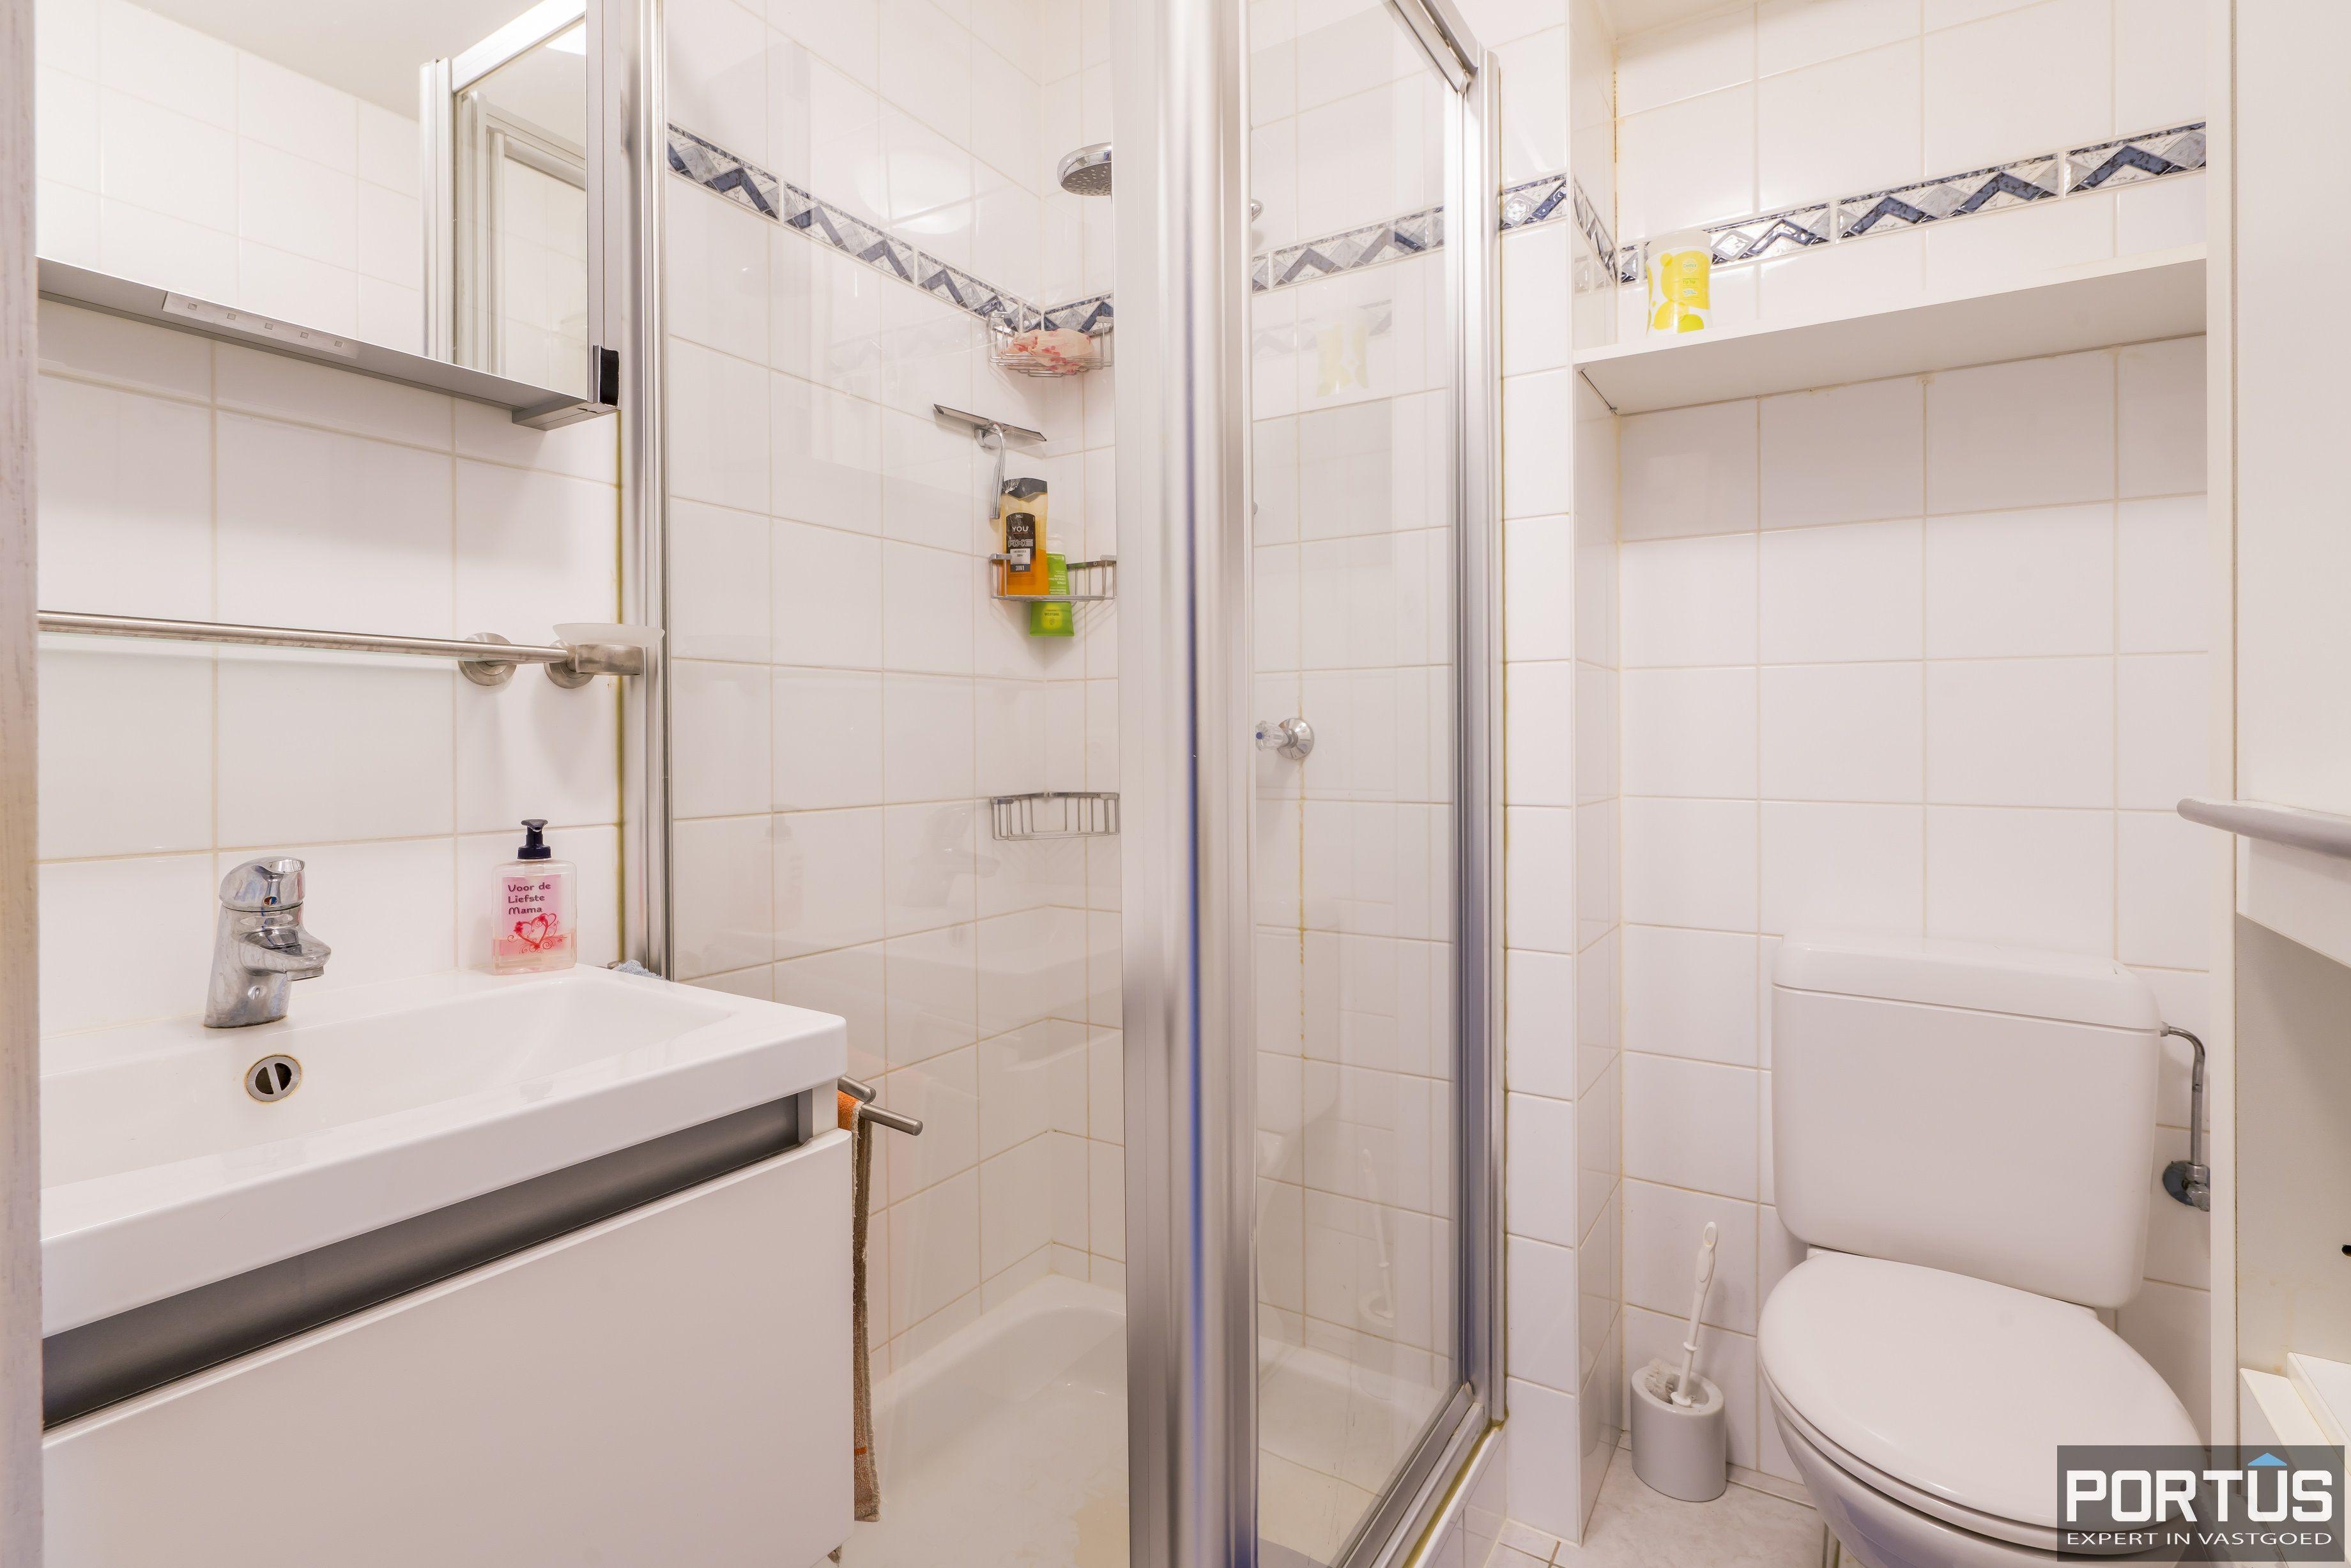 Instapklaar appartement met 1 slaapkamer te koop te Westende - 12049